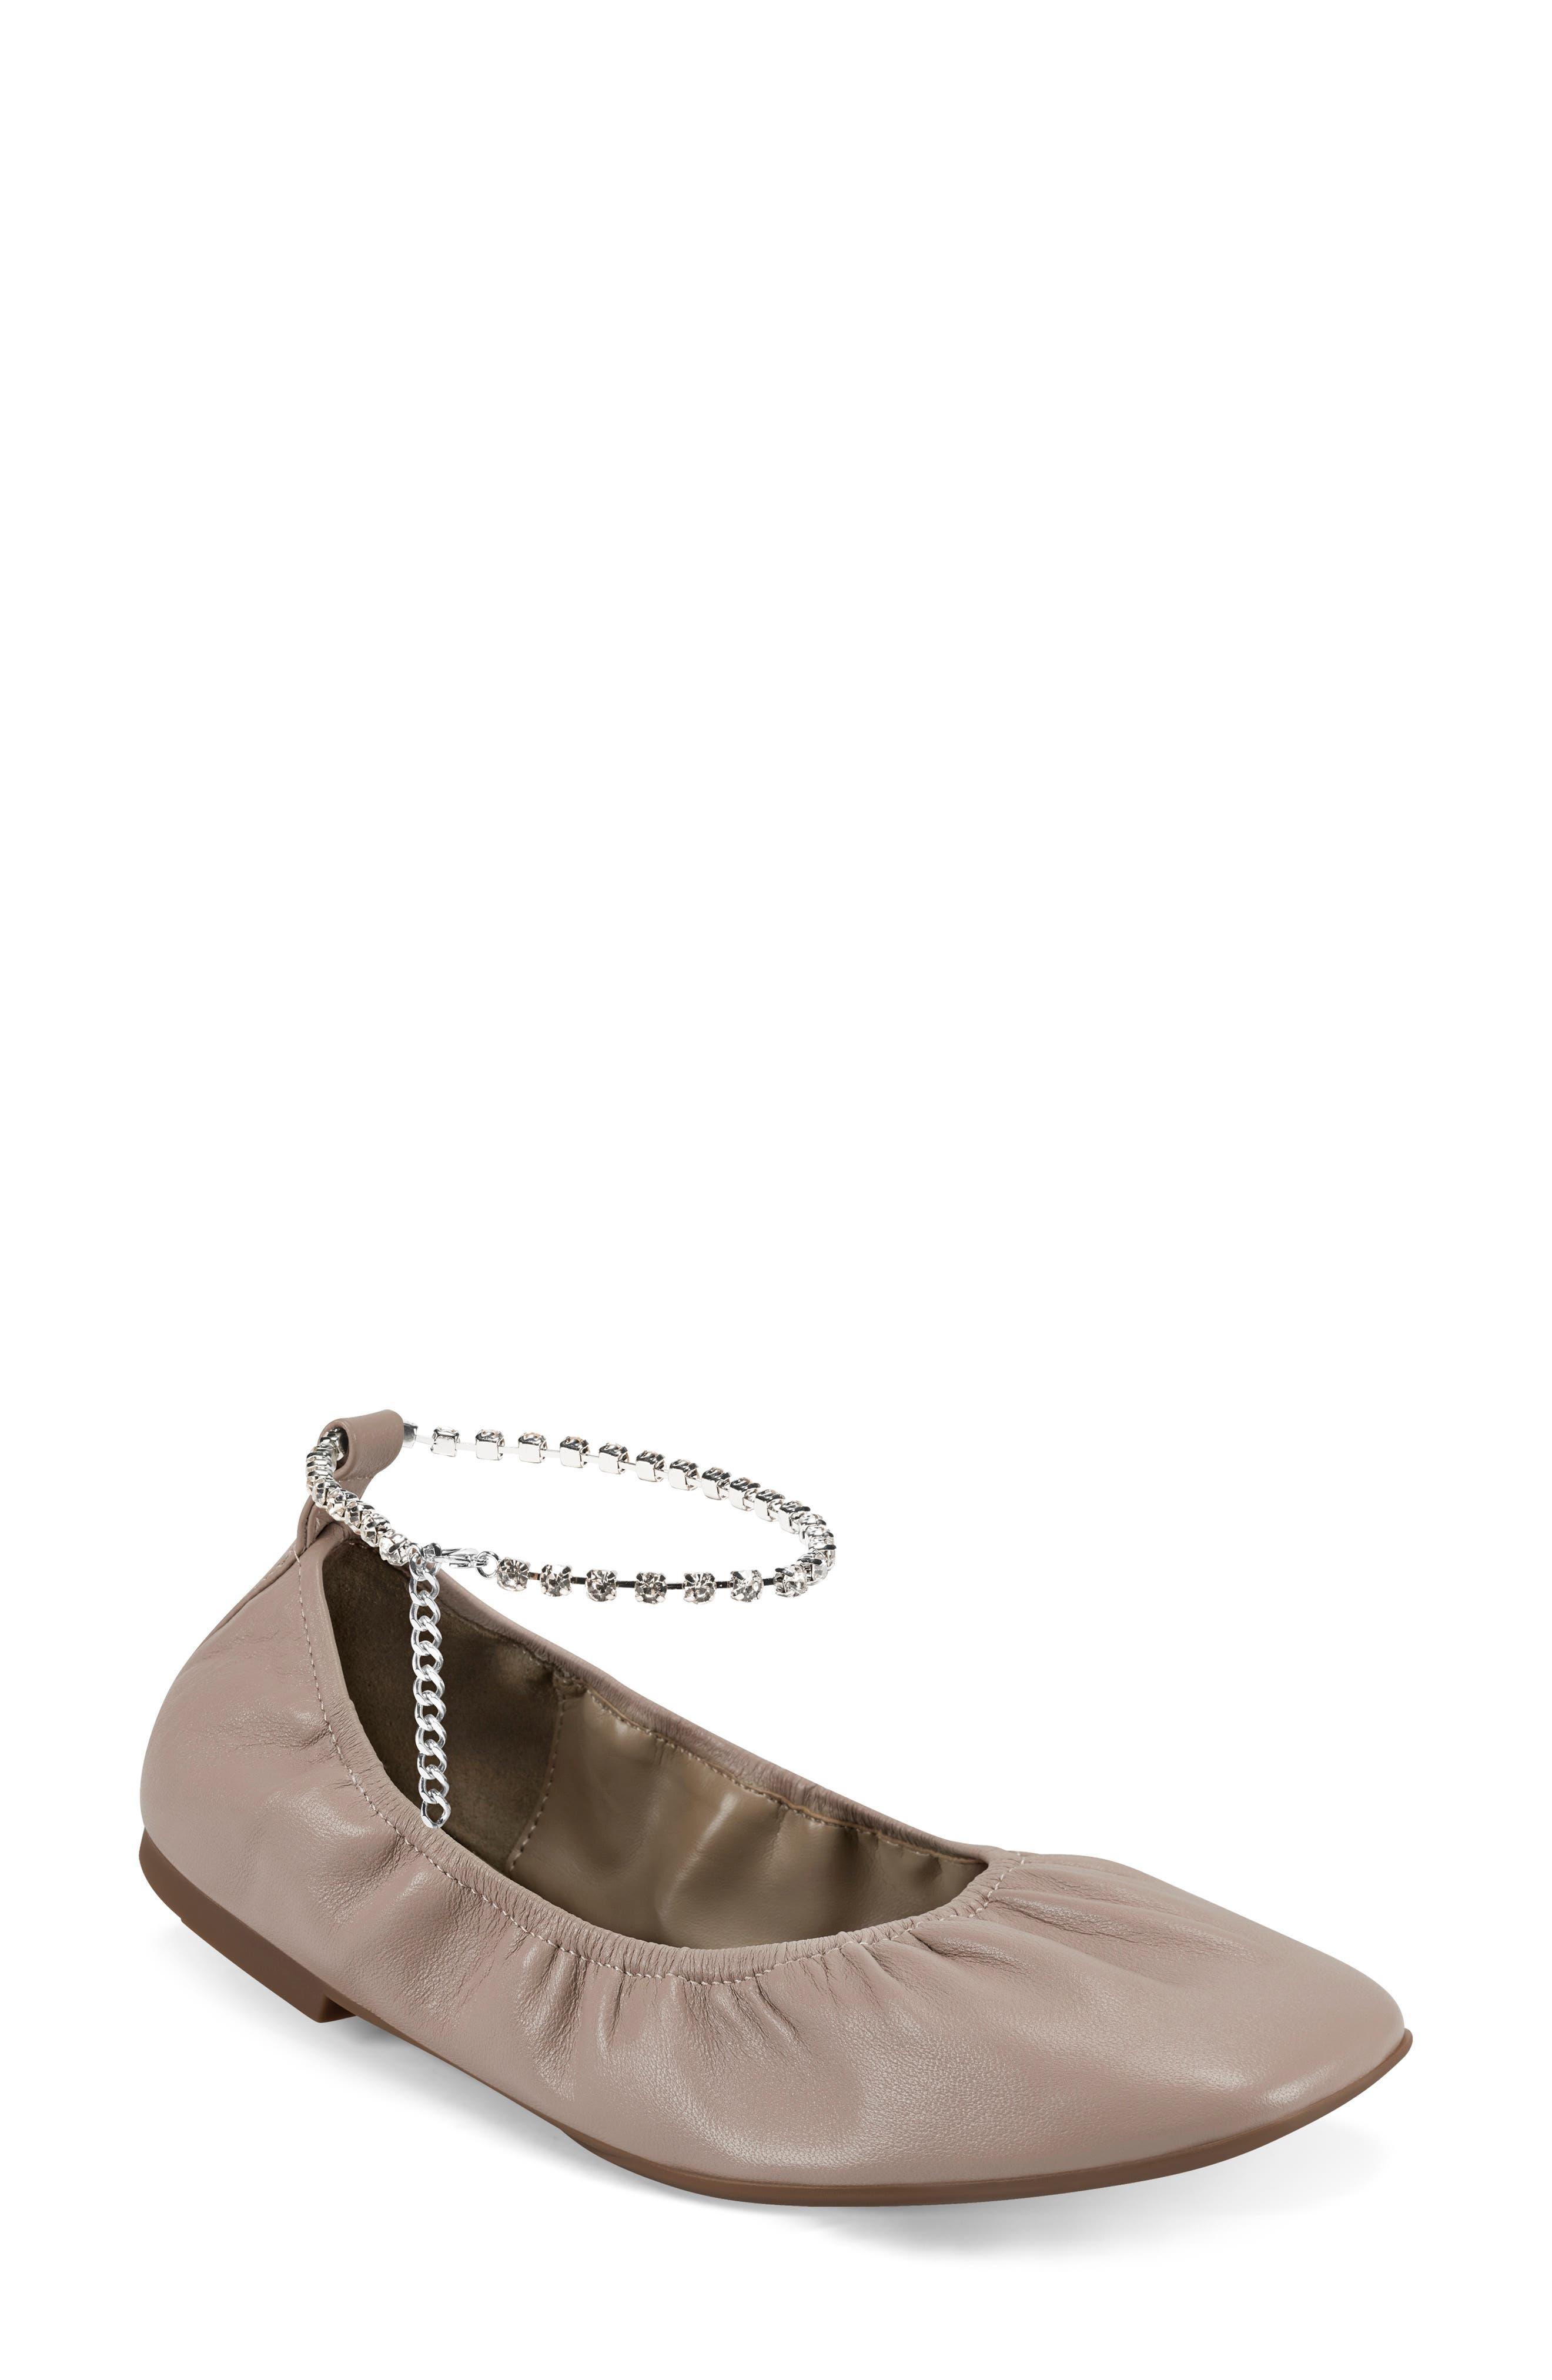 Rachie Anklet Ballet Flat